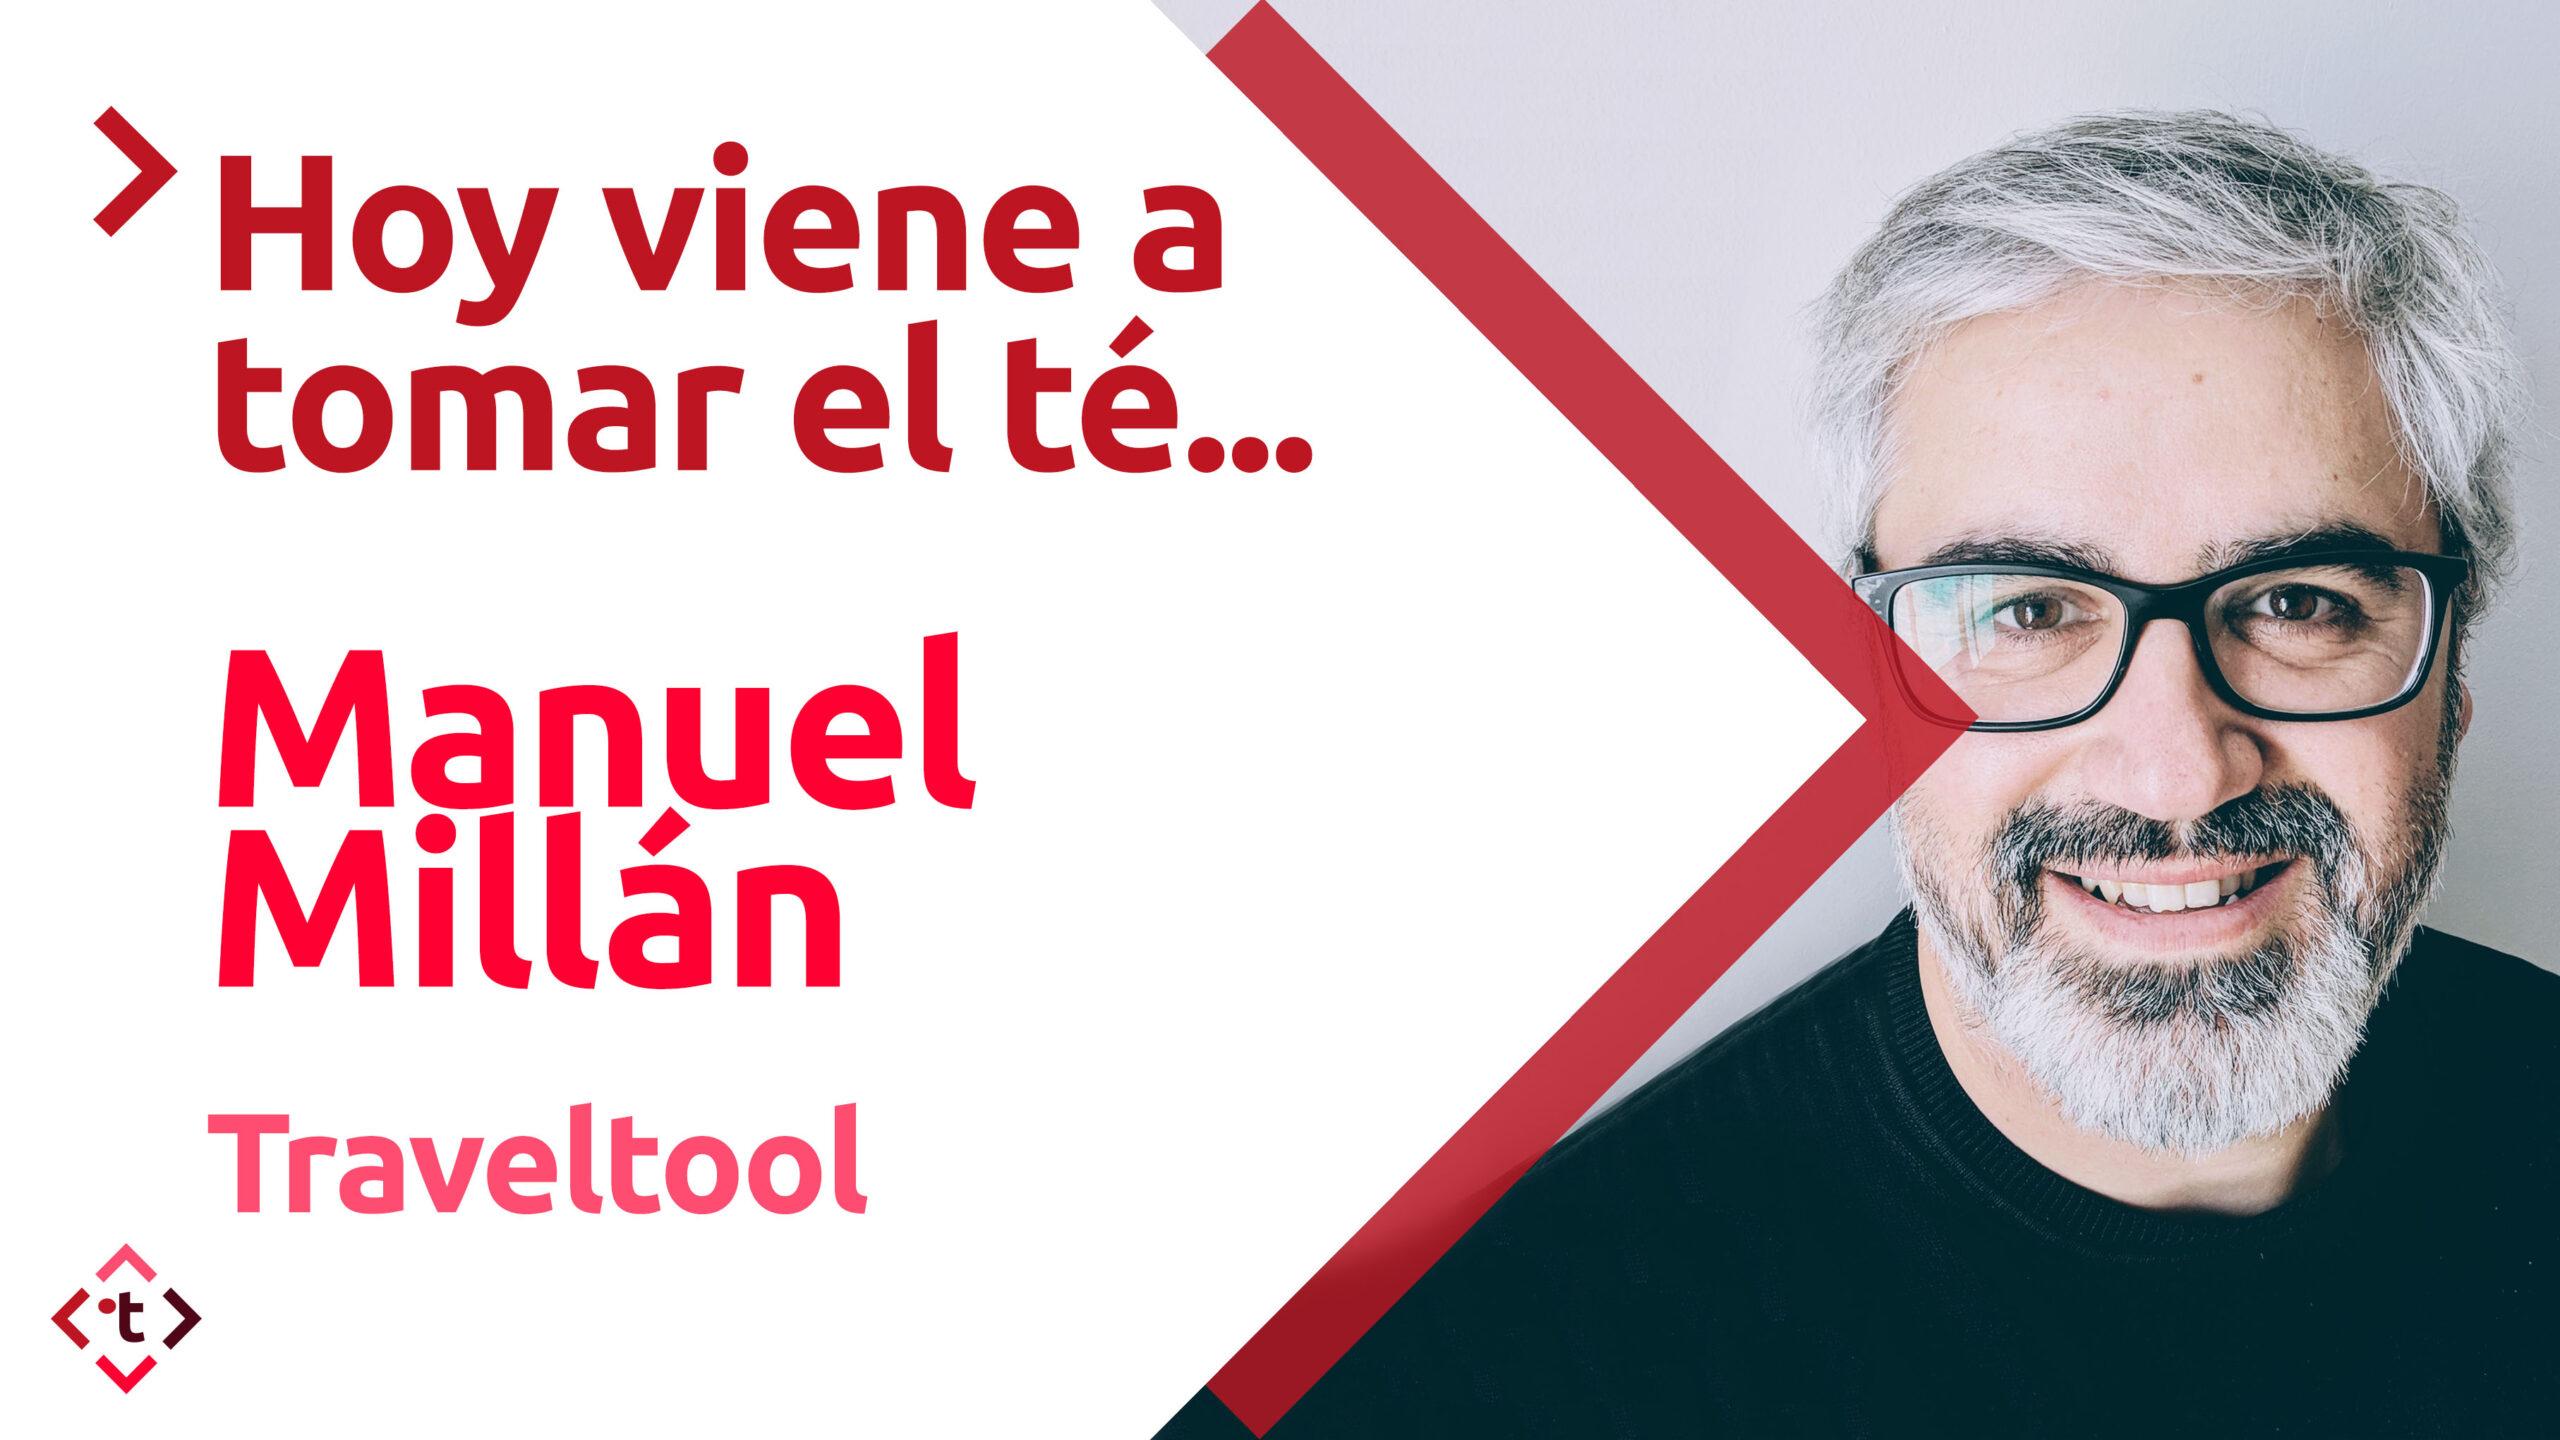 ·Manuel Millán